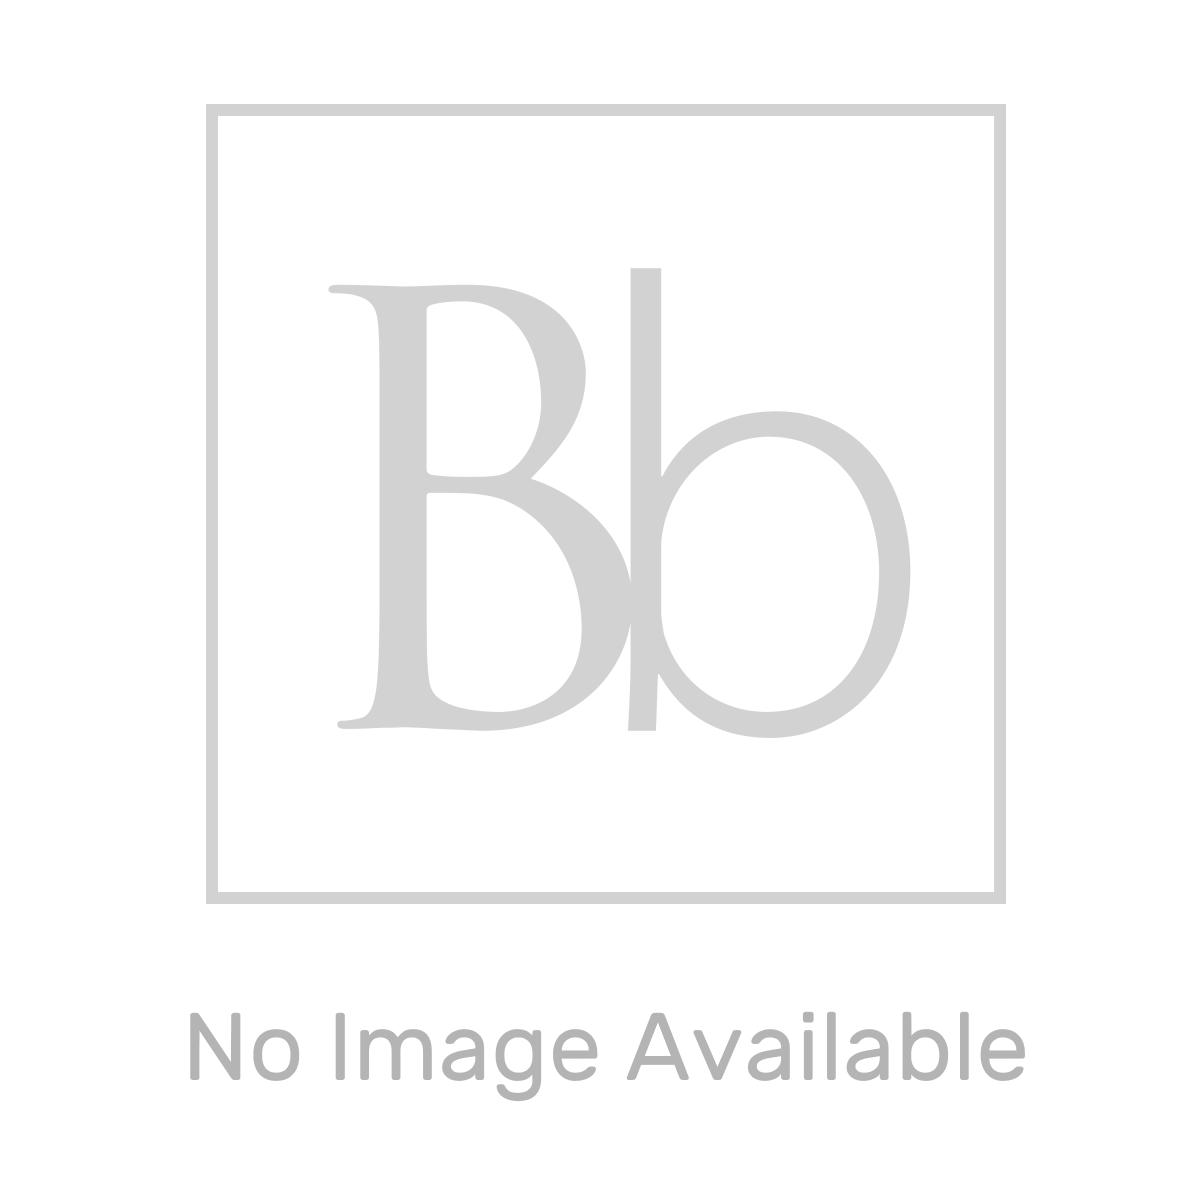 Frontline Aquaglass Closing Walk In Shower Enclosure